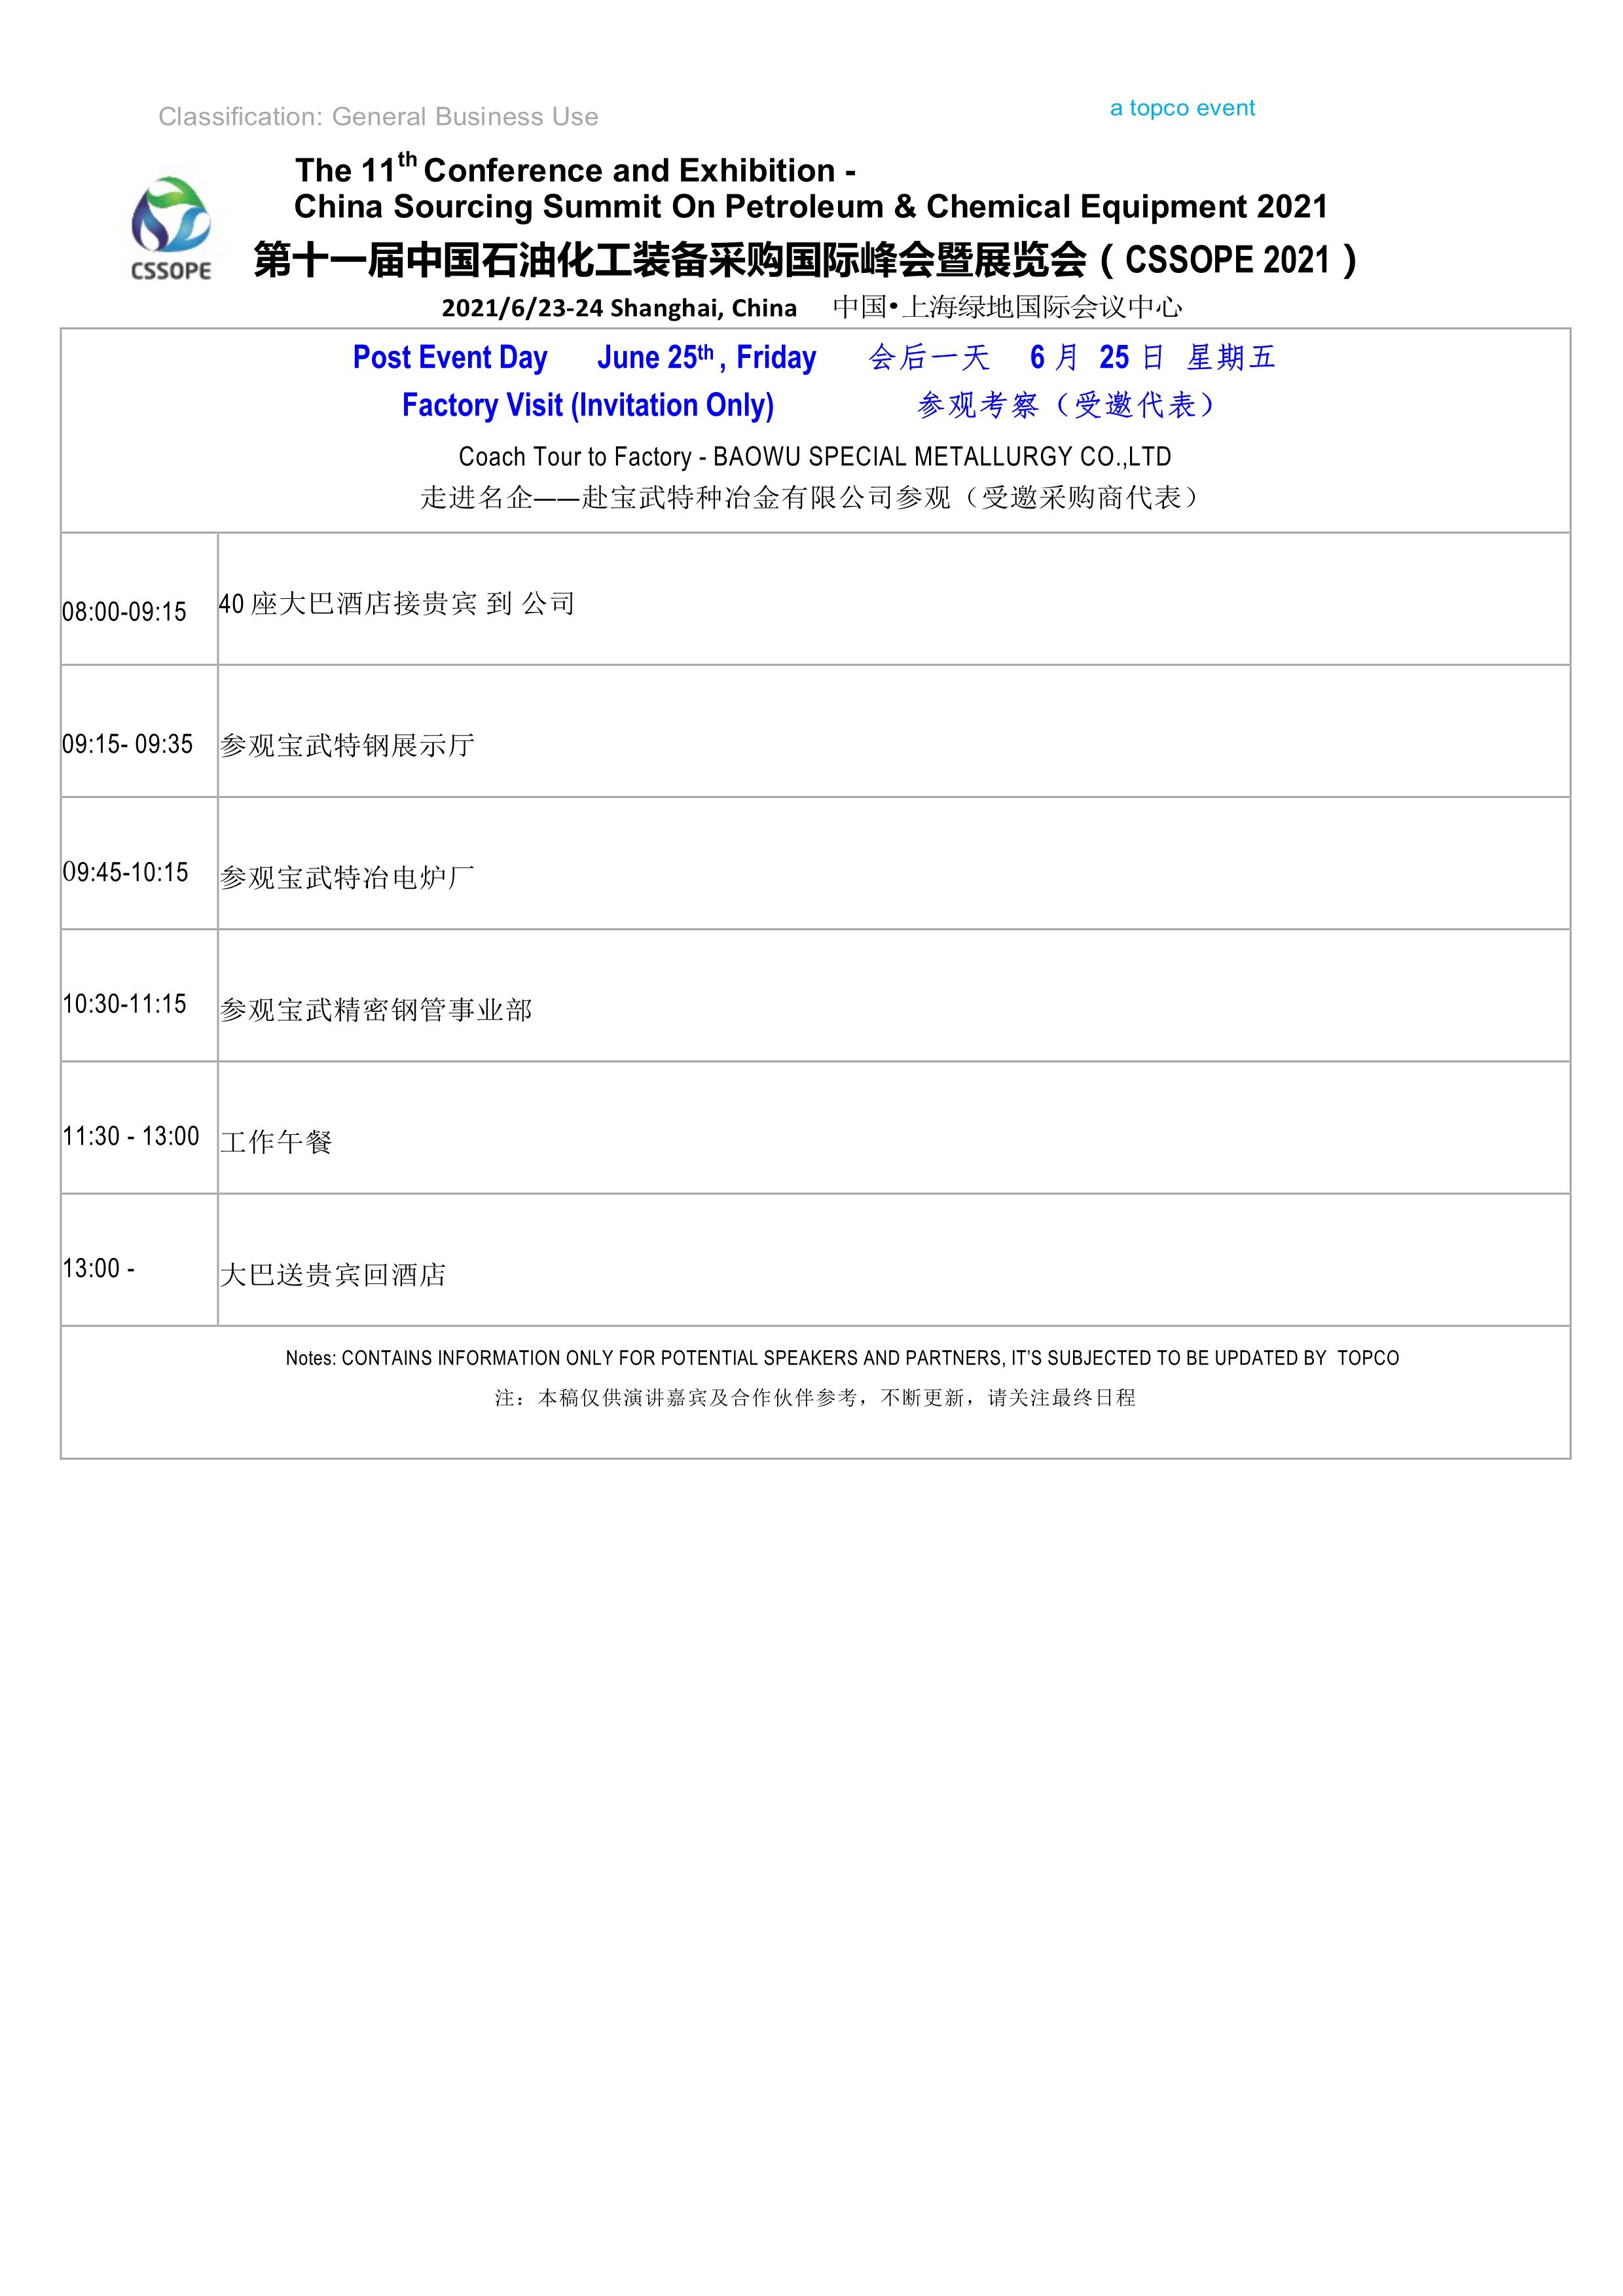 062006442205_0NEW新拟简版CSSOPE2021Agenda日程(4)_8.Jpeg